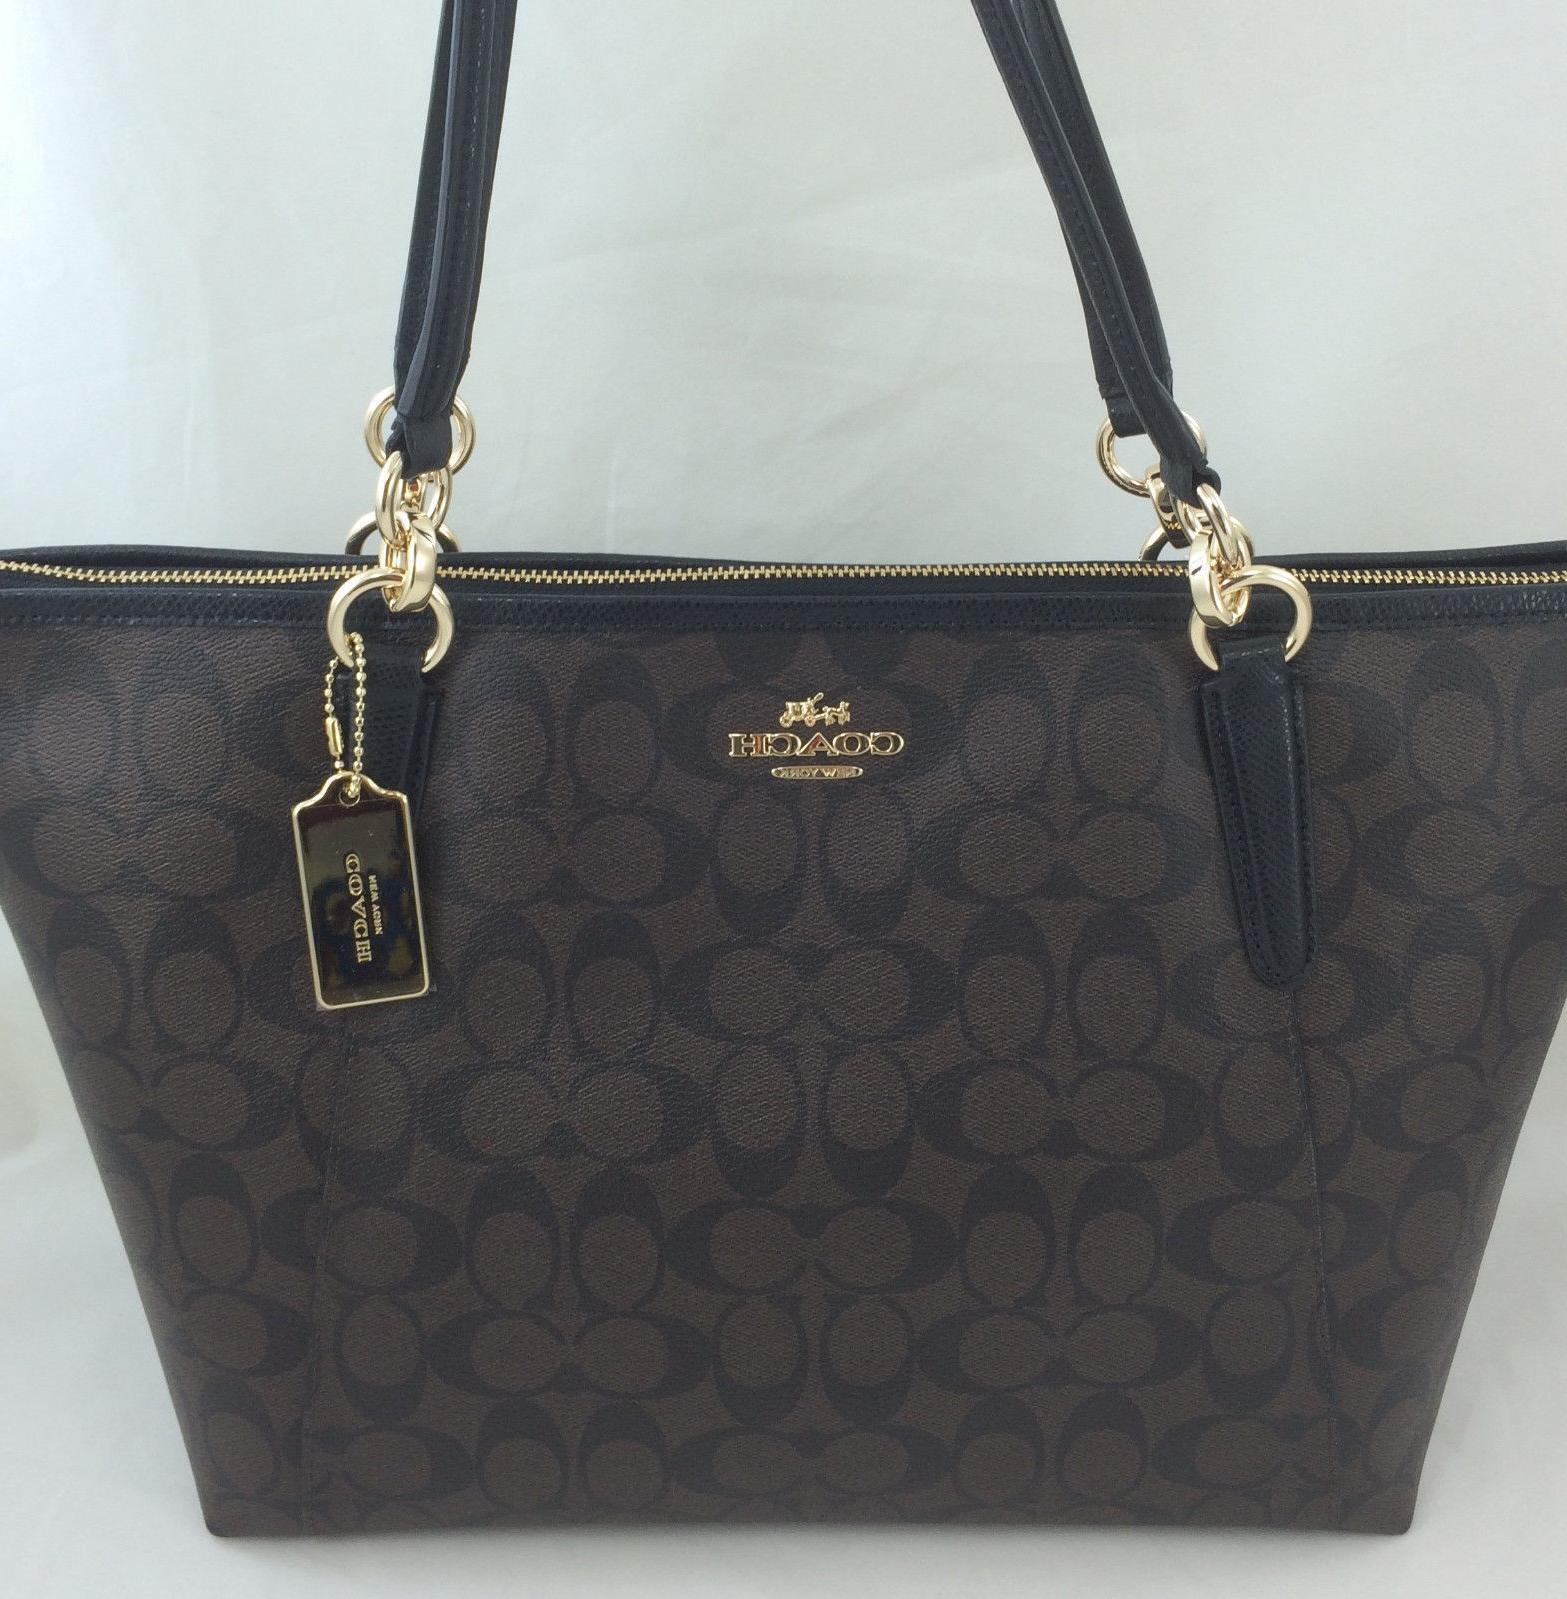 New Authentic COACH F58318 AVA Signature Tote Handbag Purse